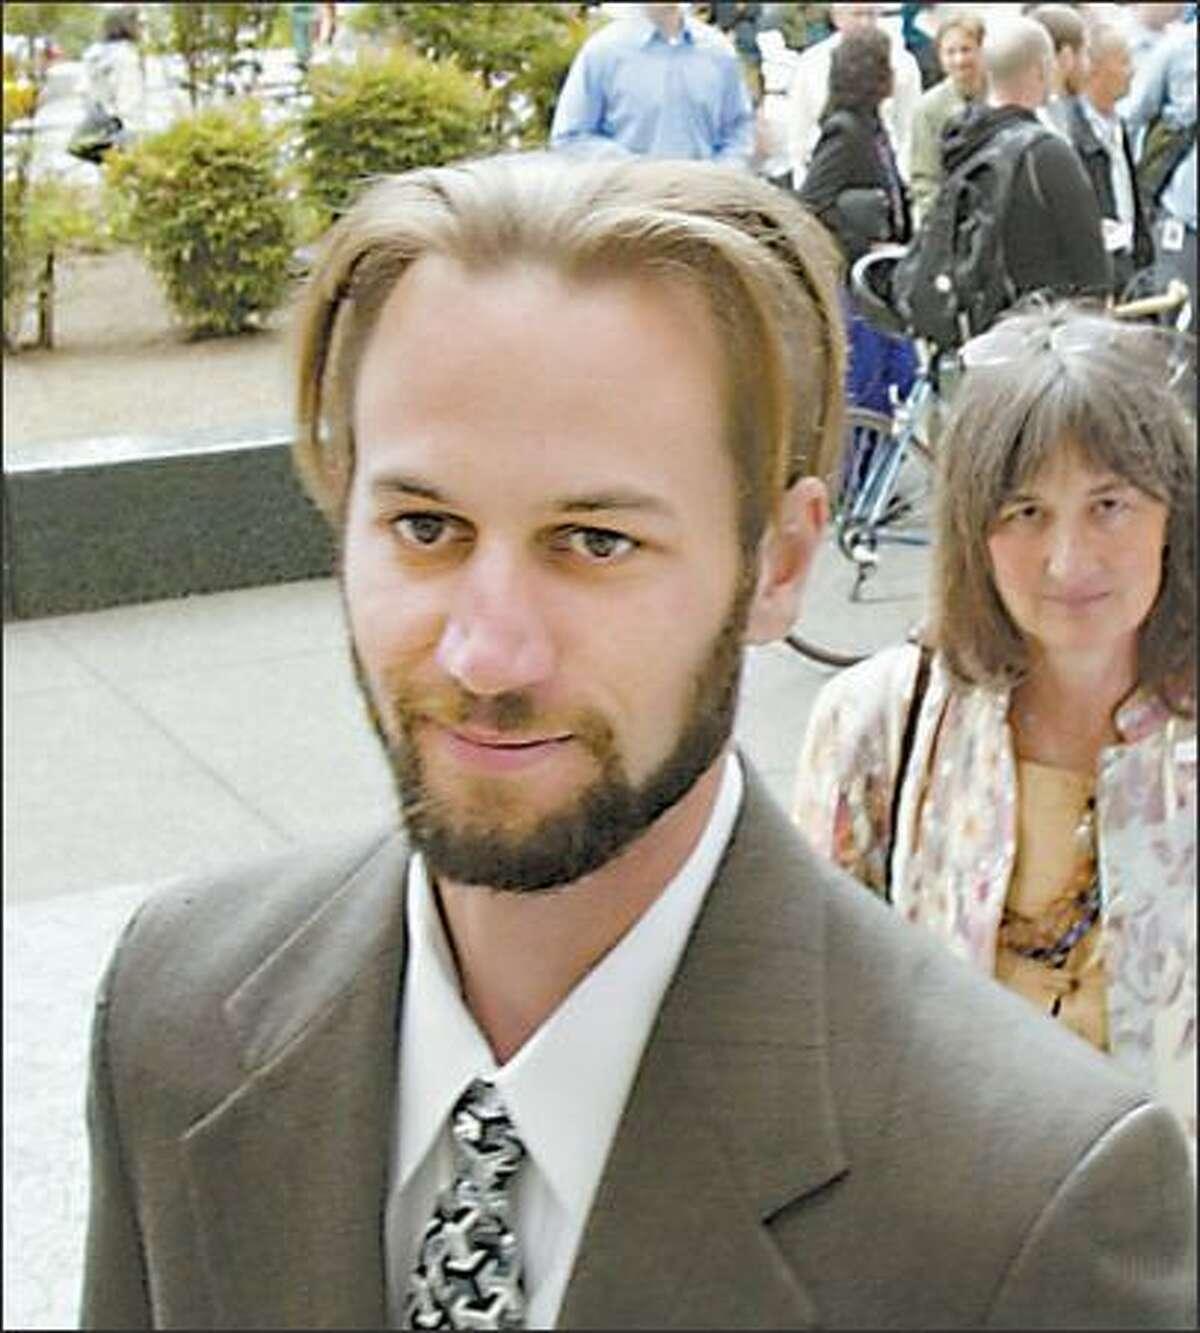 Zachary Treisman was arrested June 30 for investigation of third-degree assault.